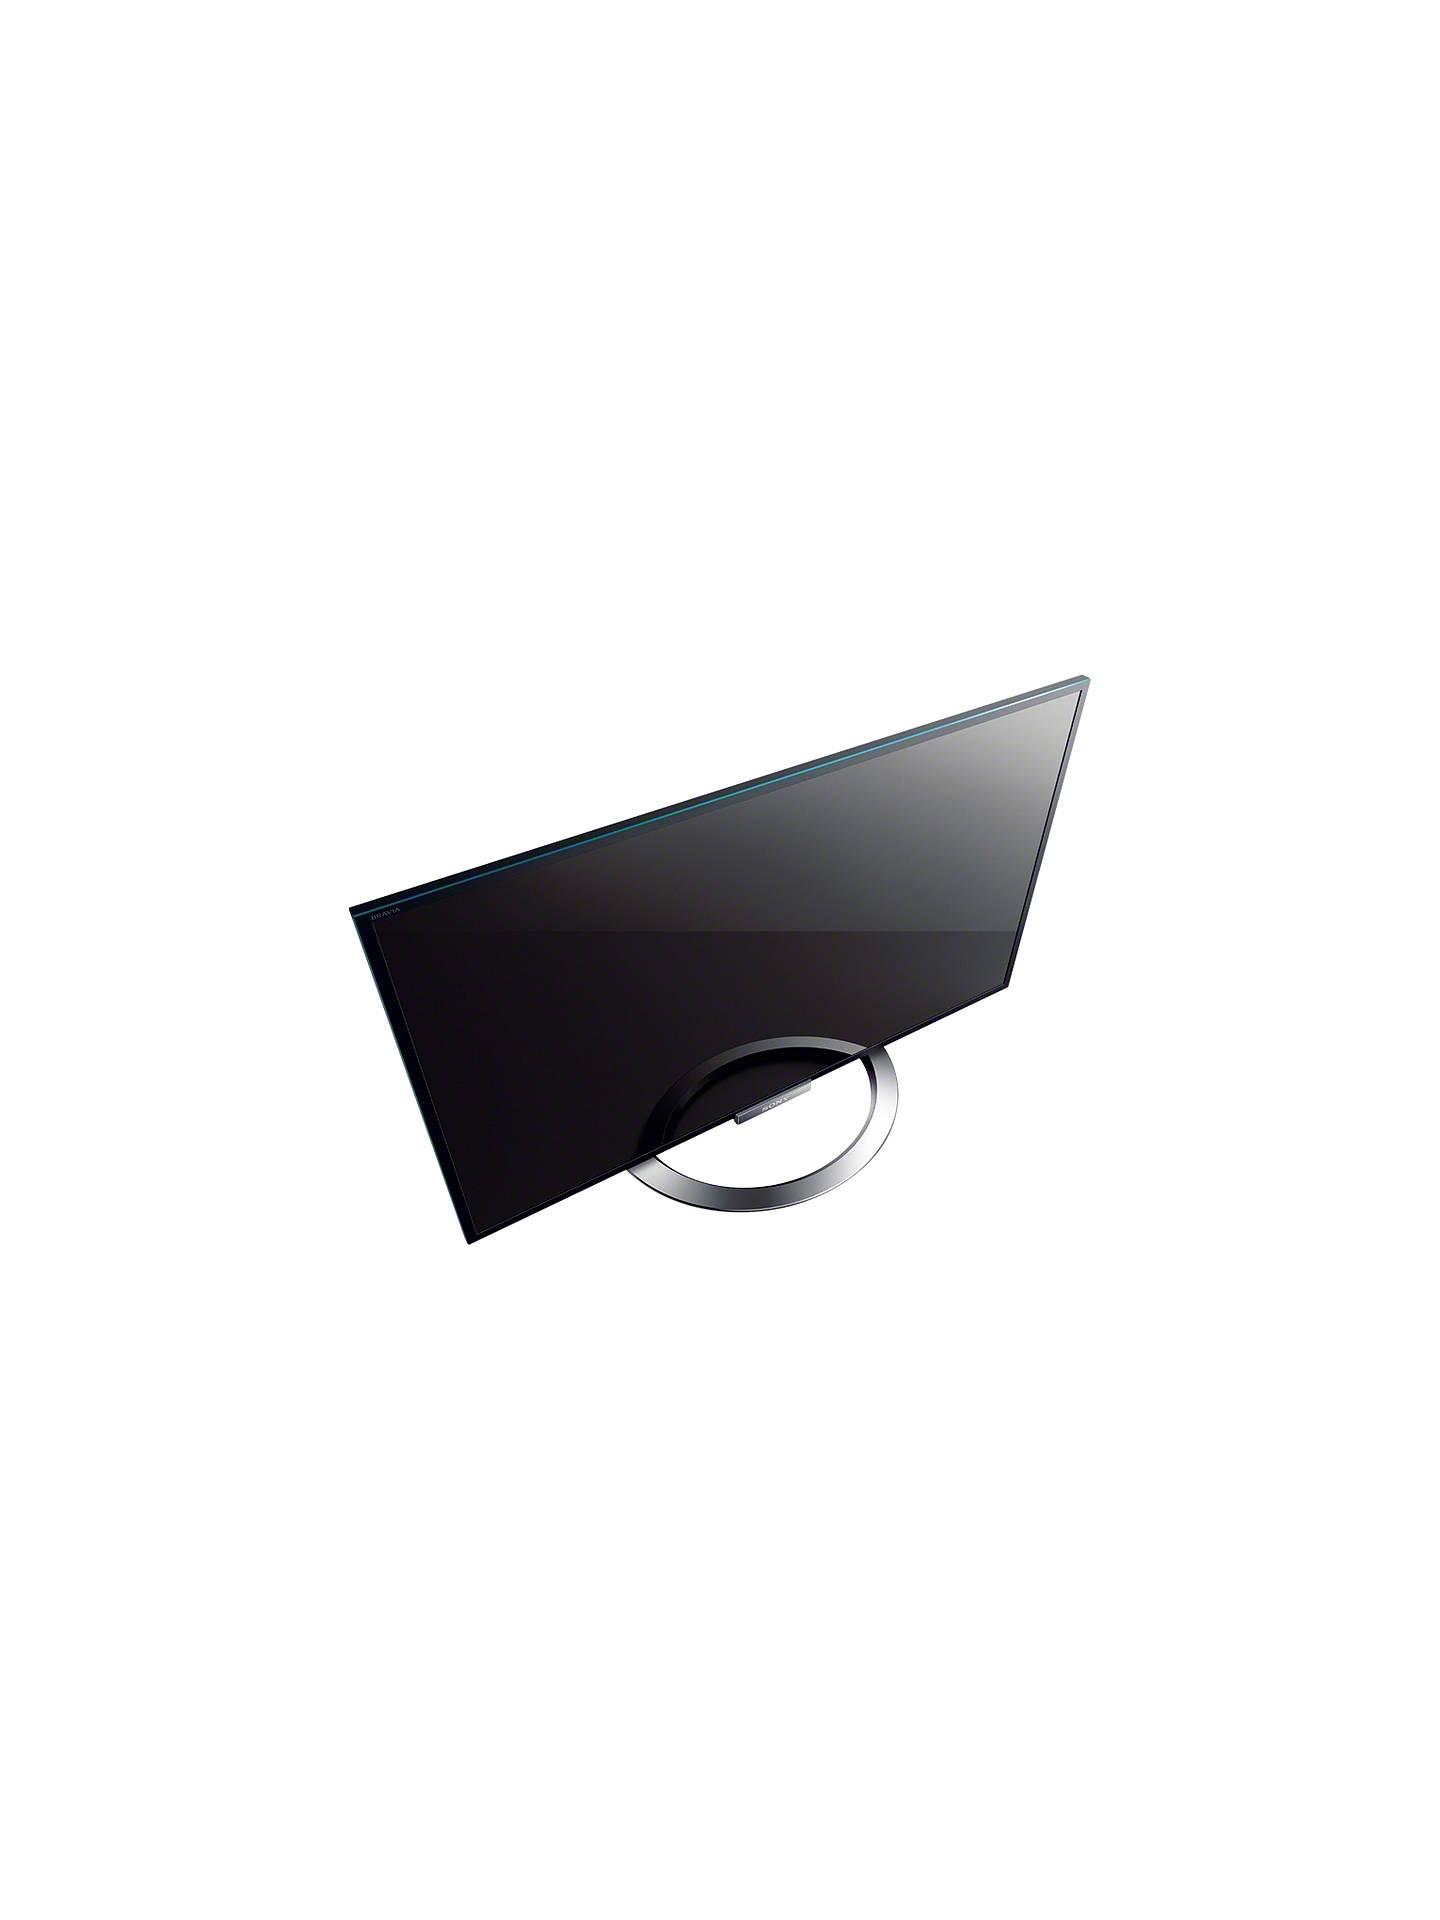 Sony Bravia KDL46W905 LED HD 1080p 3D Smart TV, 46